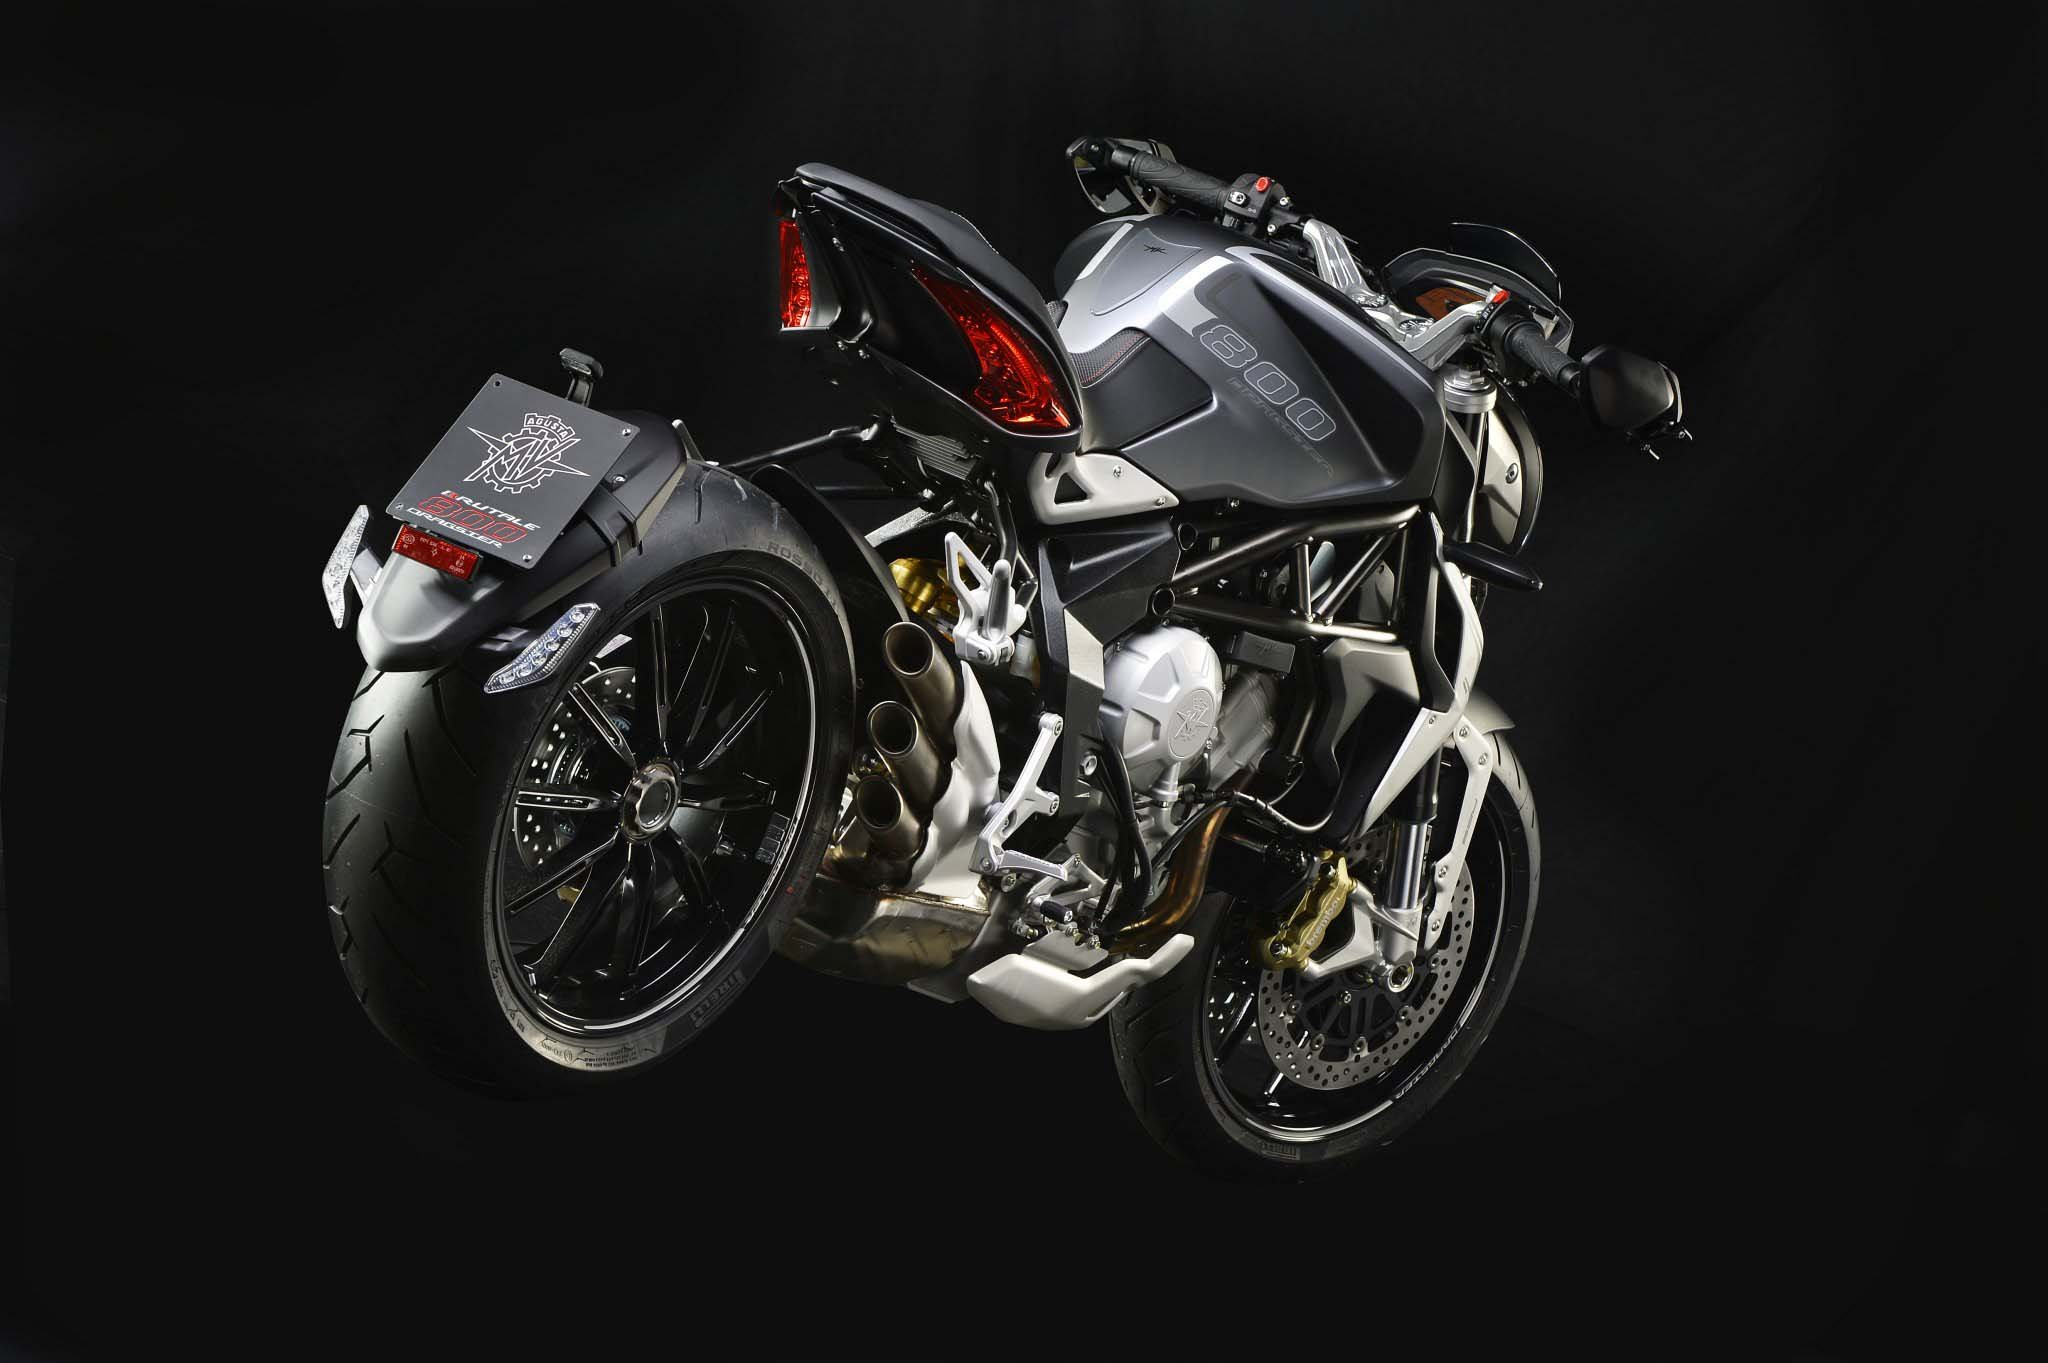 Wallpaper Mv Agusta Brutale 800 2017 Automotive Bikes: 2014 MV-Agusta Brutale 800 Dragster Superbike Bike